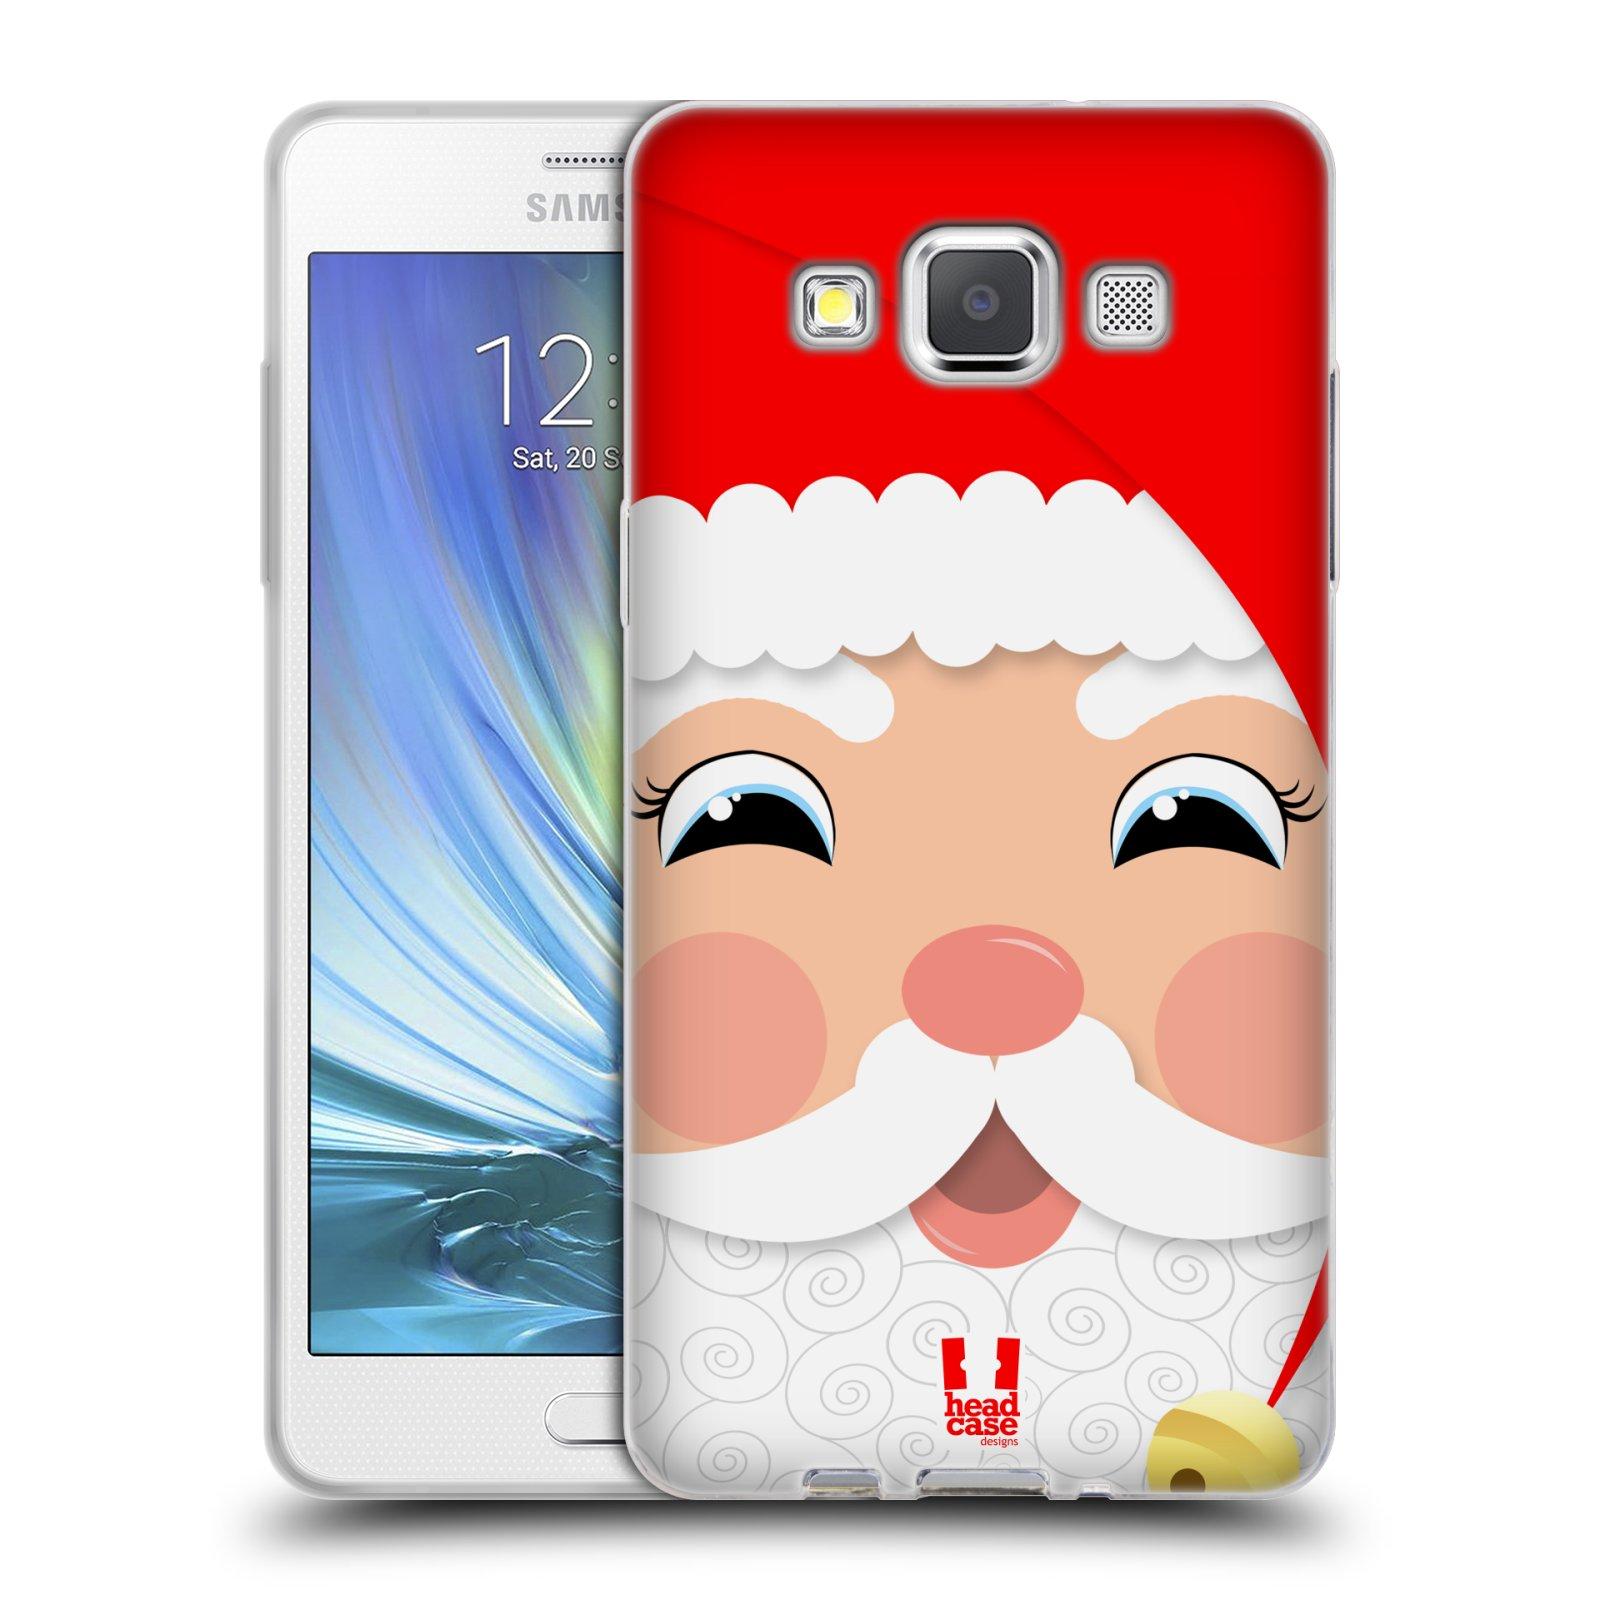 HEAD CASE silikonový obal na mobil Samsung Galaxy A5 vzor Vánoční tváře kreslené SANTA CLAUS